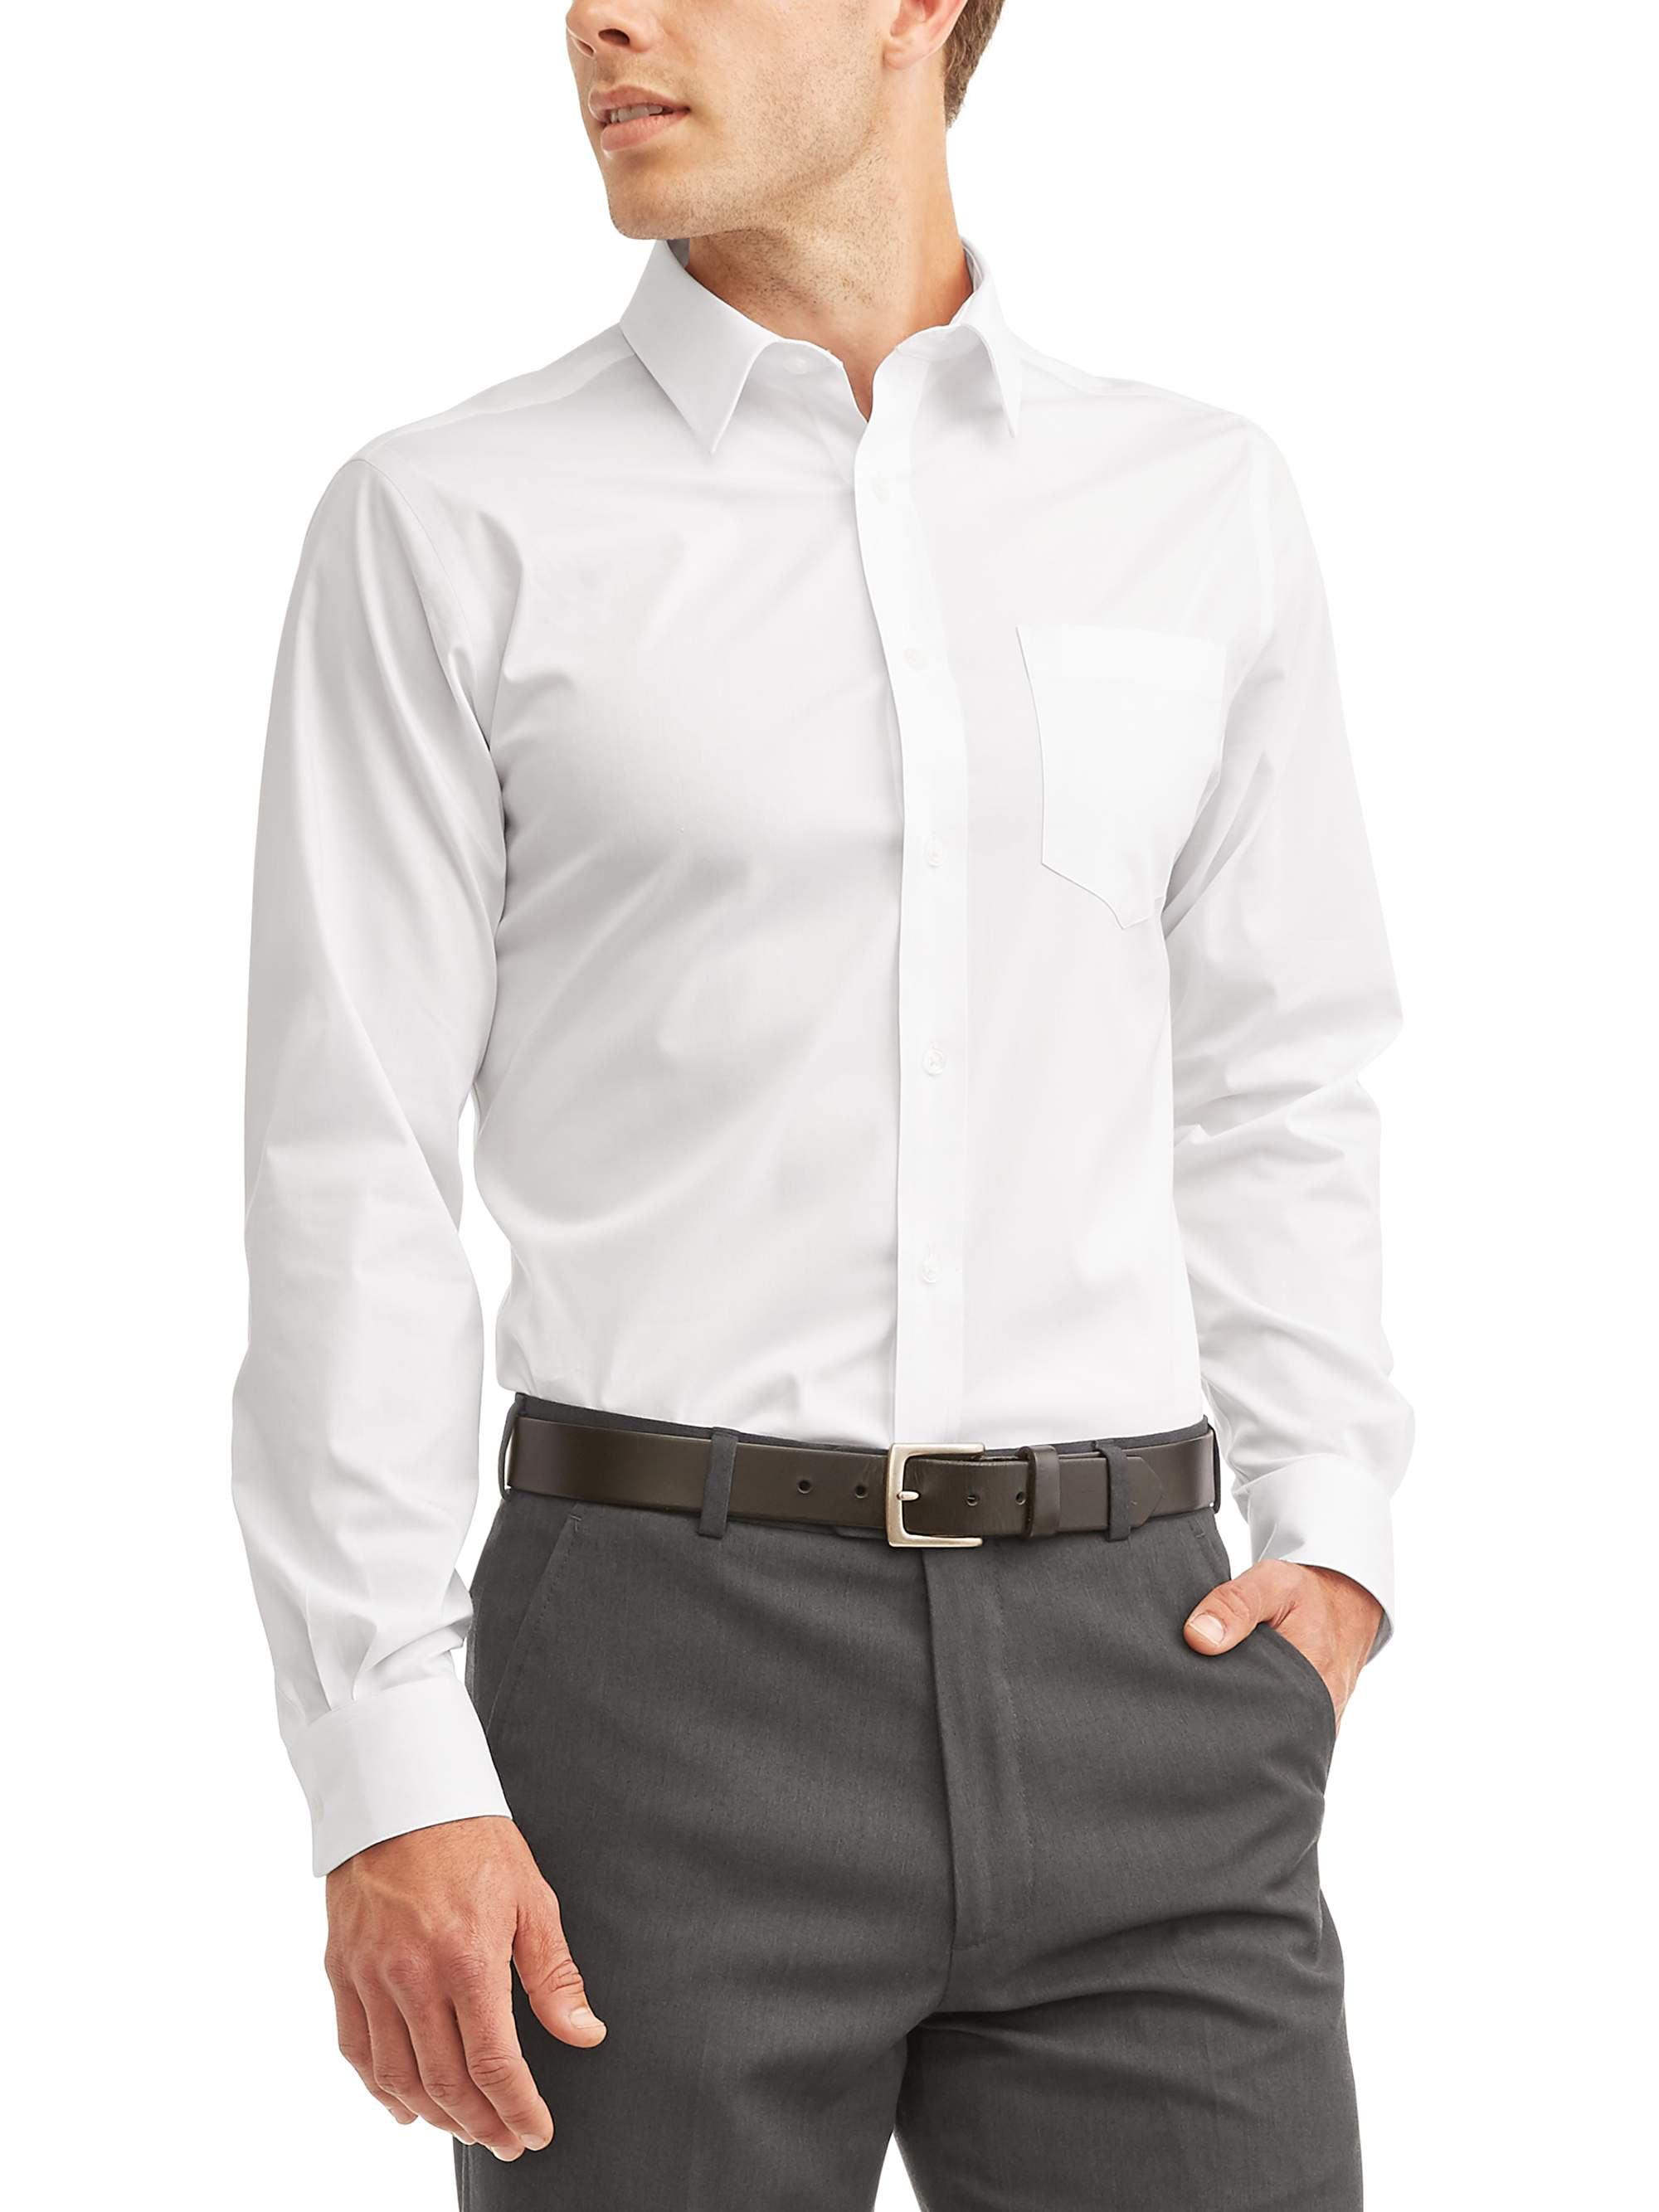 GEORGE - George Men's Long Sleeve Performance Dress Shirt, Up to 3XL - Walmart.com